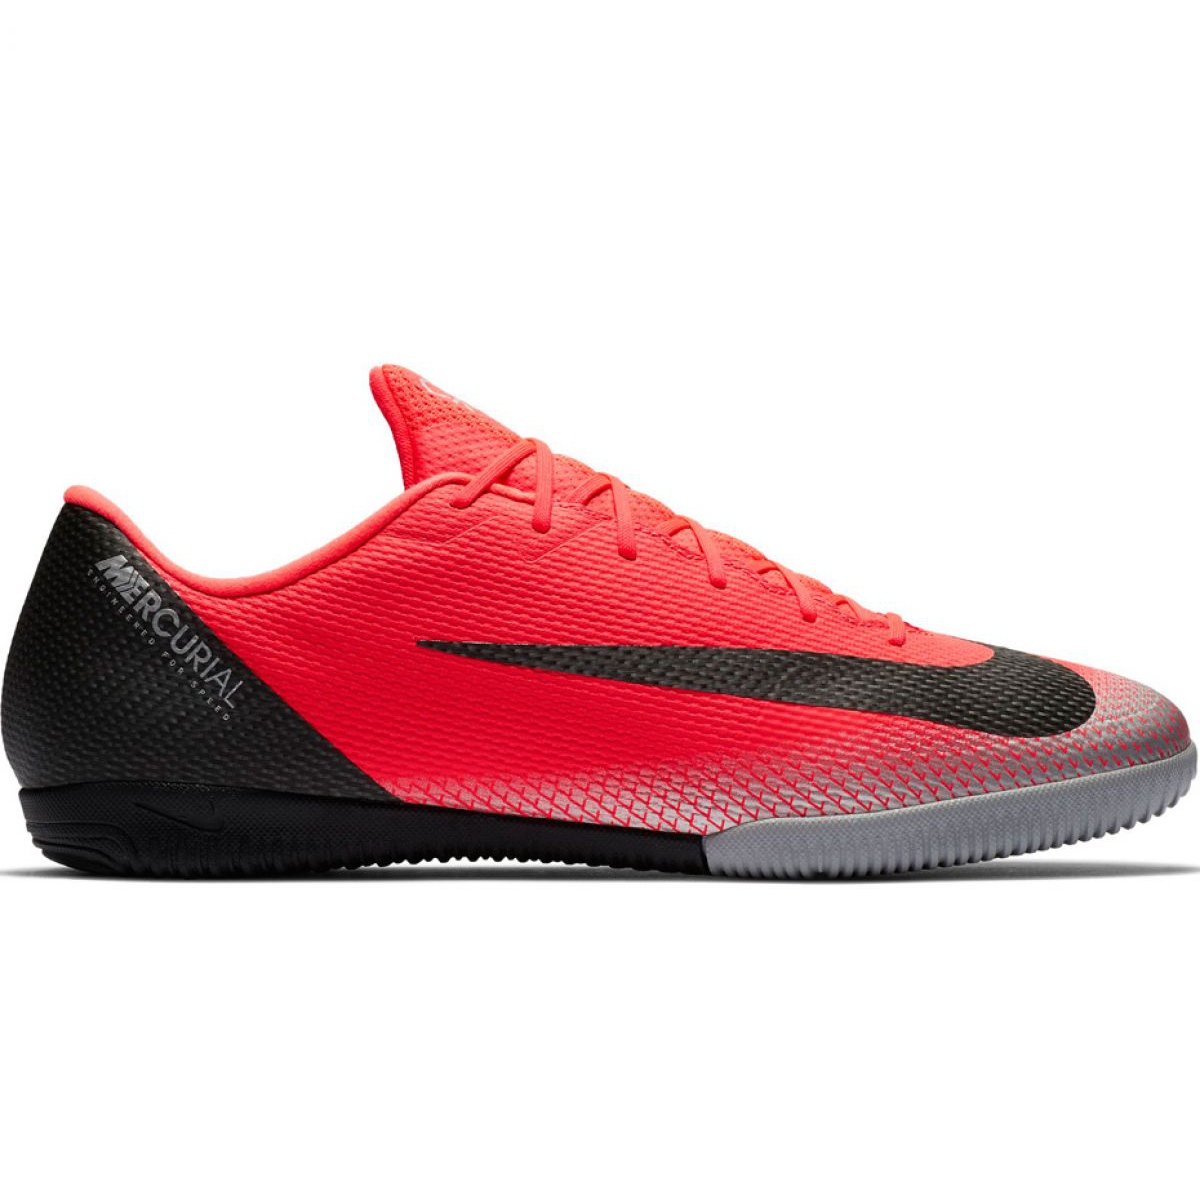 12 Cr7 Mercurial Academy Ic M 600 X Nike Vapor Eisschuhe Aj3731 6gfvYb7y